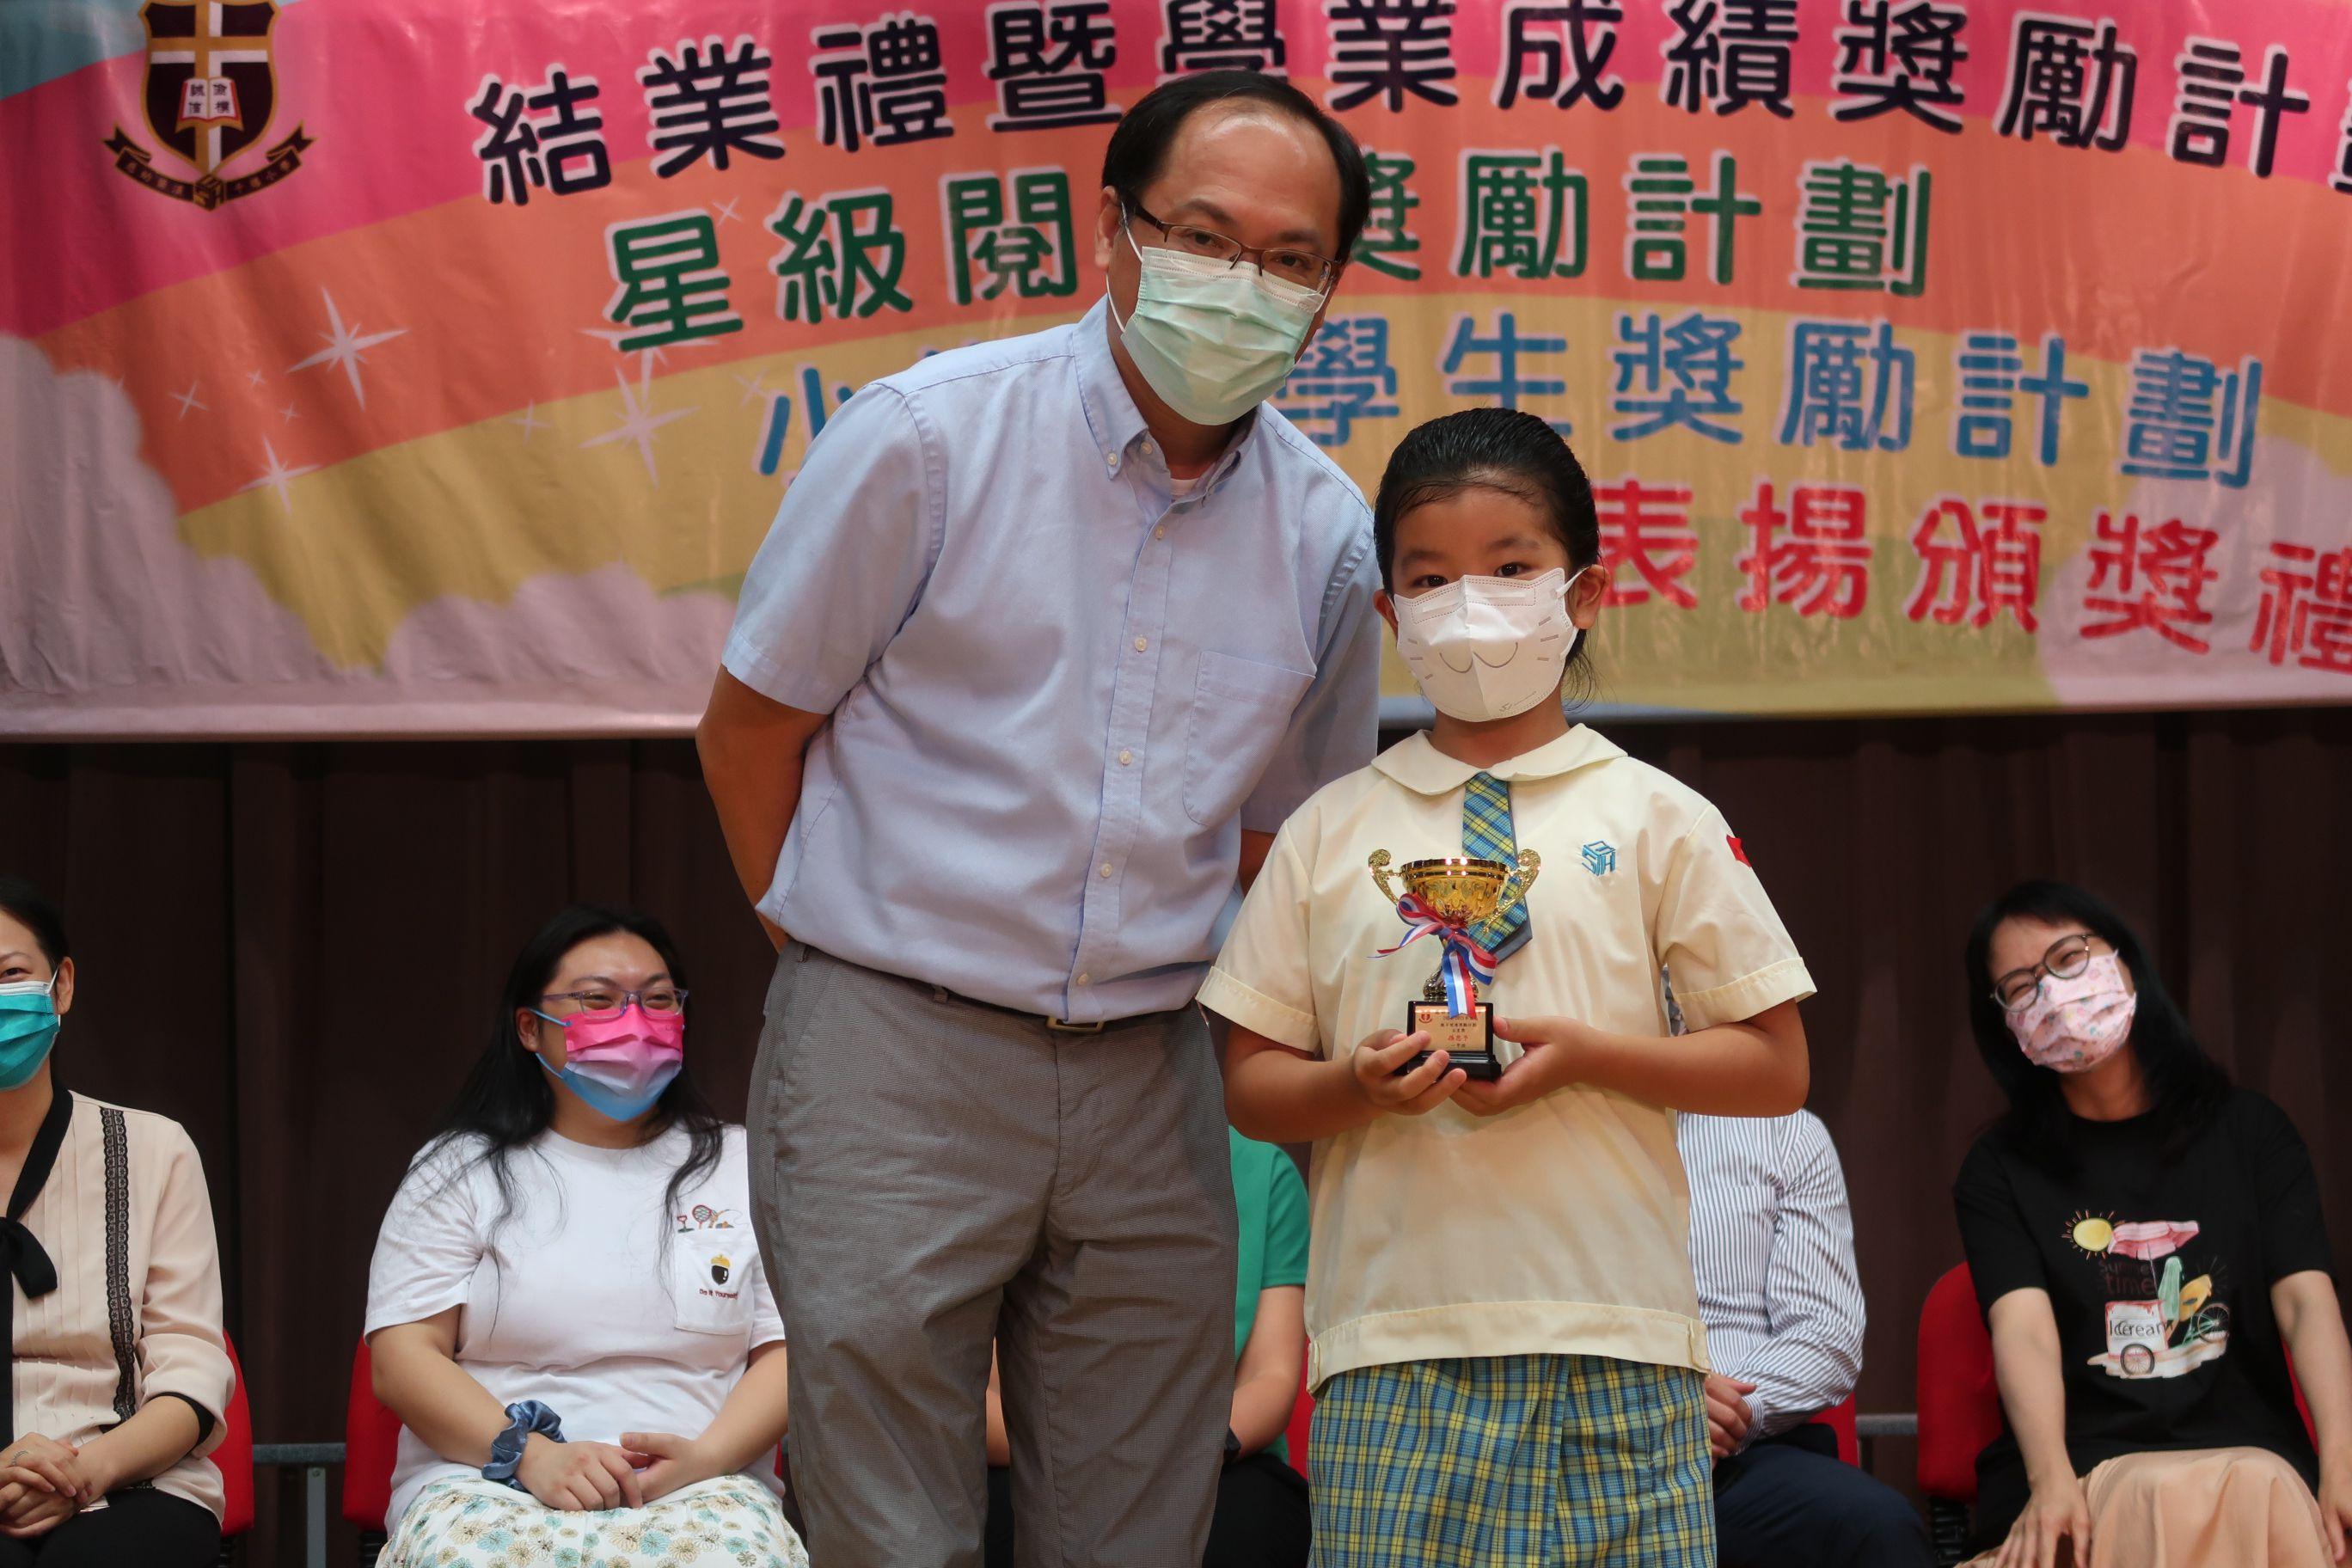 https://syh.edu.hk/sites/default/files/img_5714.jpg